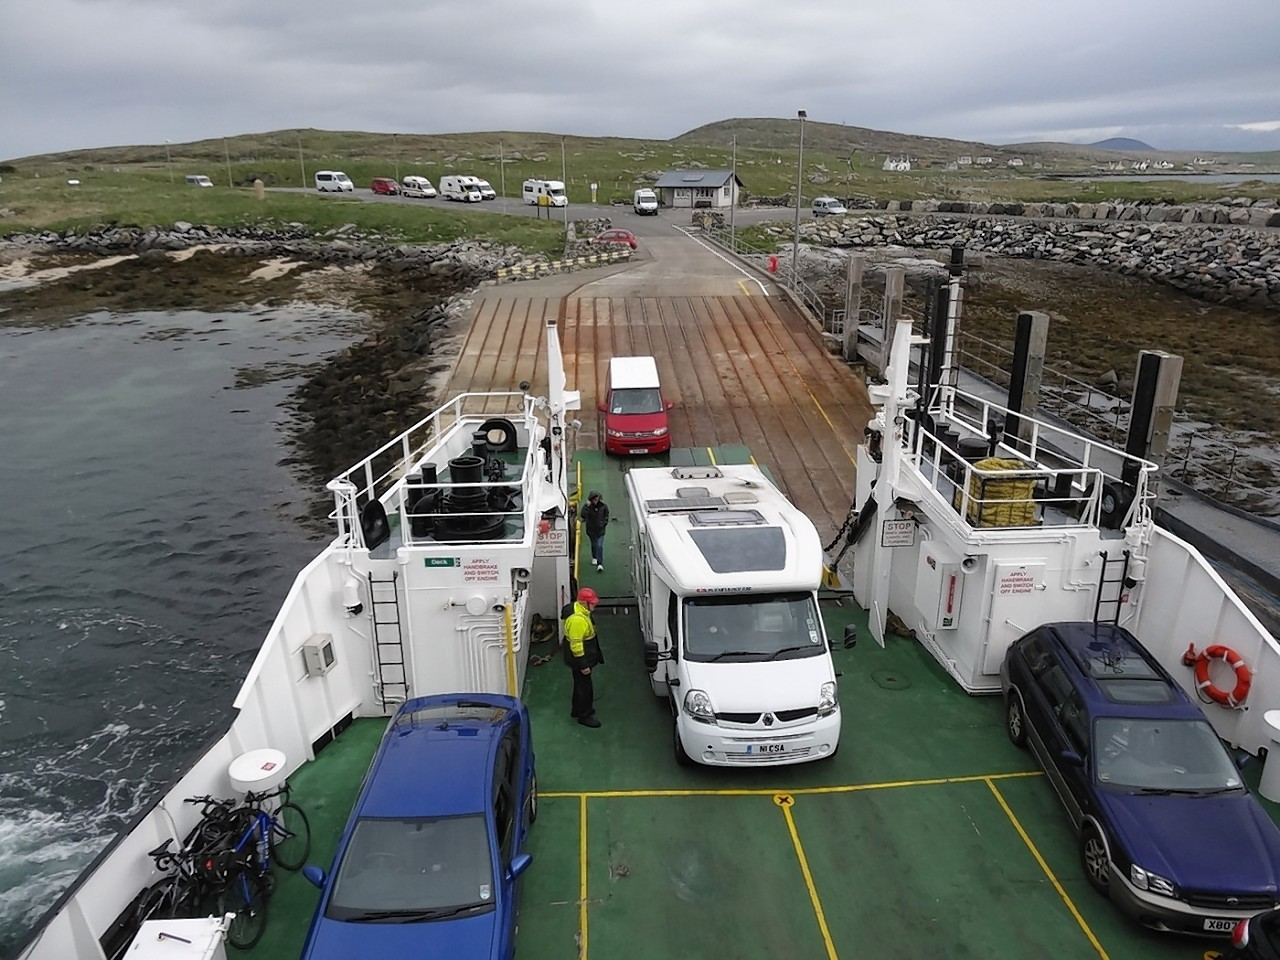 Western Isles ferry. Pic by Kevin McGlynn